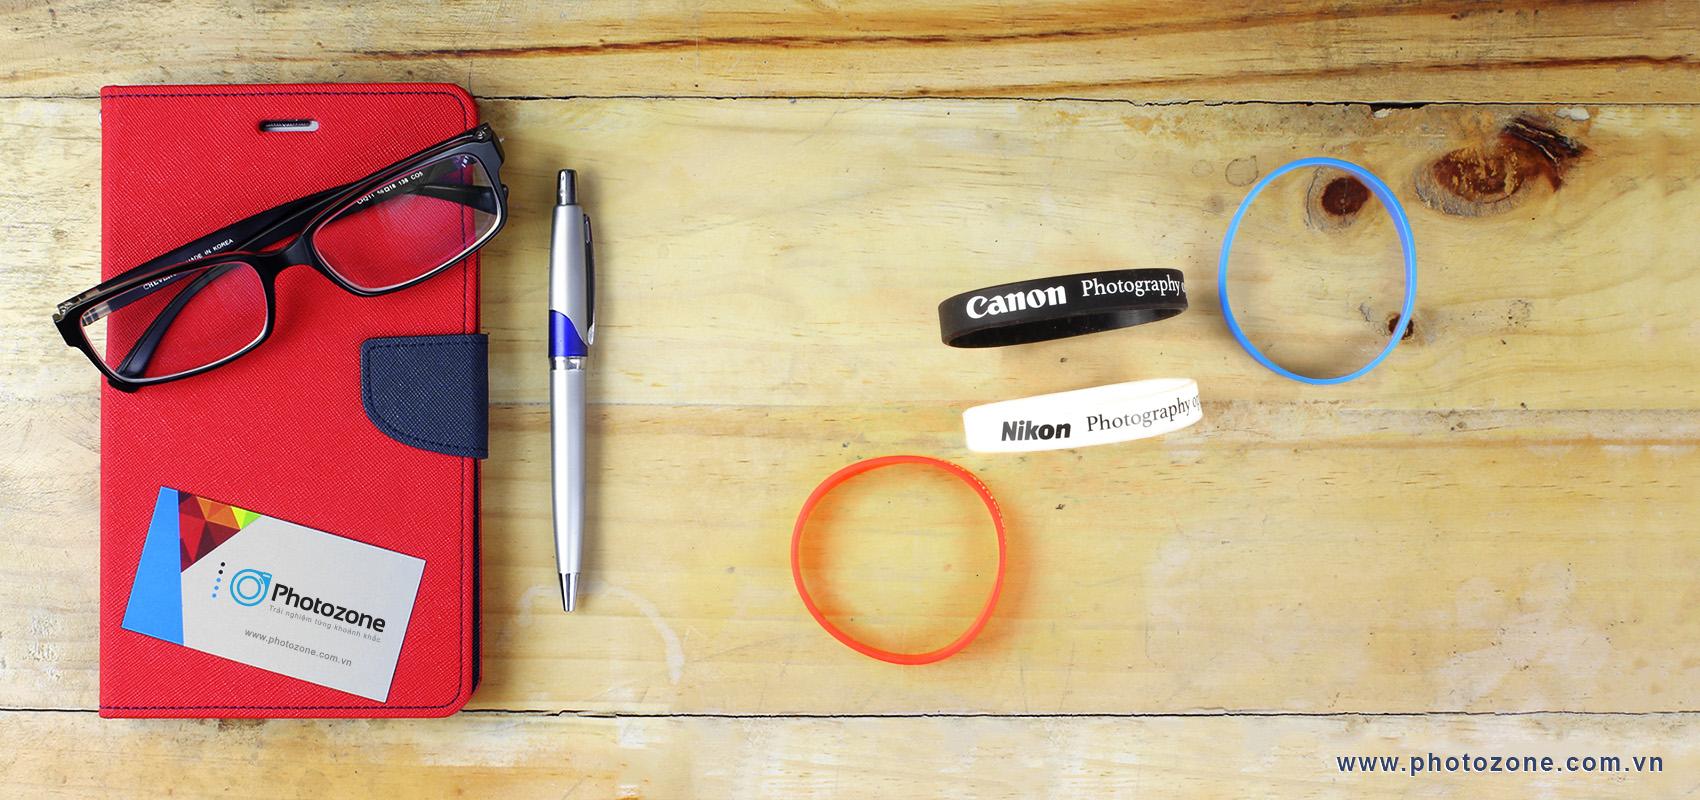 Vòng cao su Silicon bảo vệ Canon / Nikon